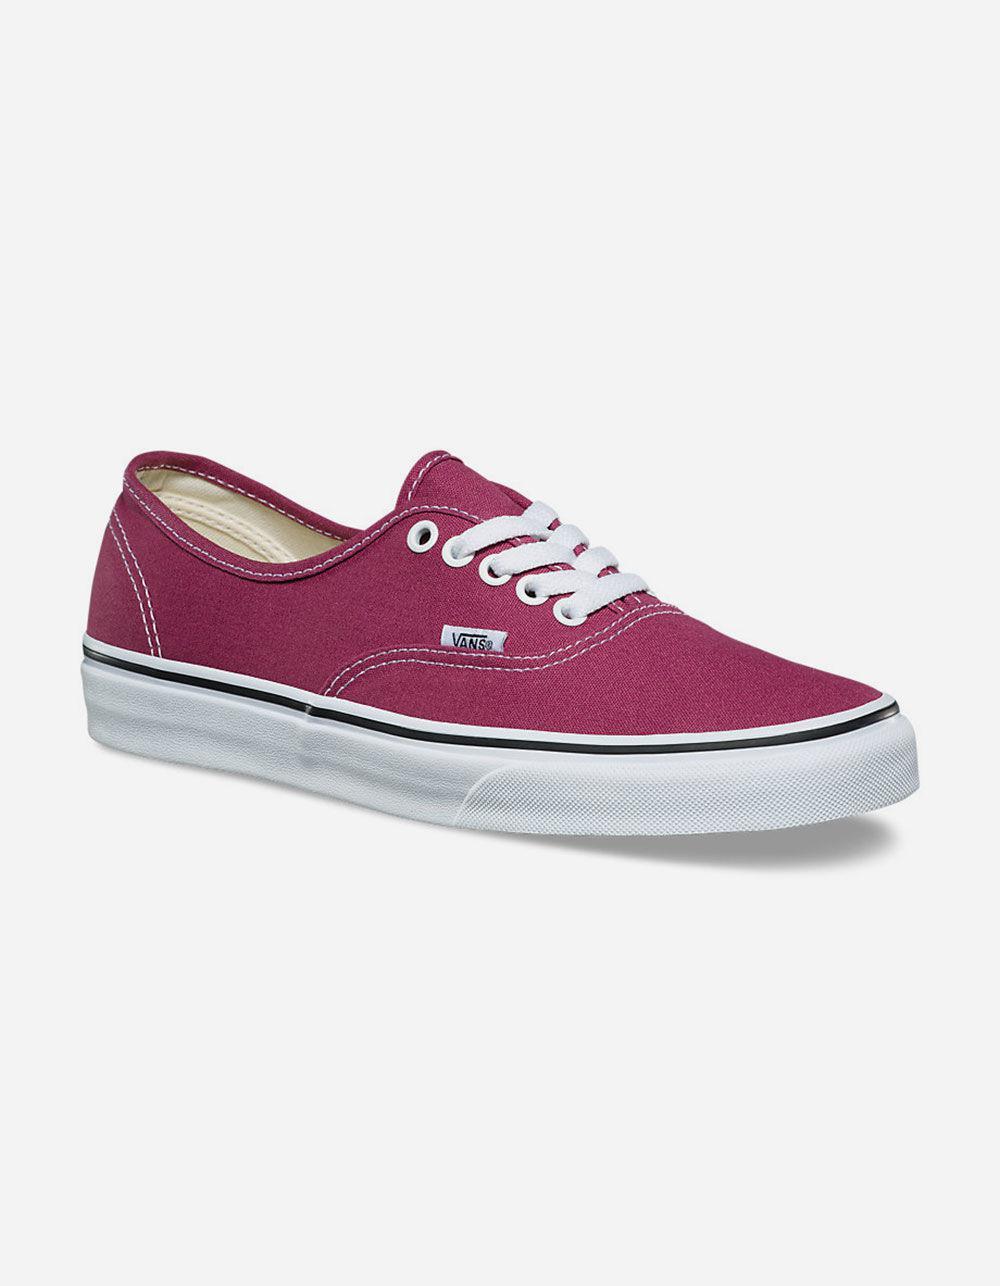 dda95358984 Lyst - Vans Authentic Dry Rose   True White Womens Shoes